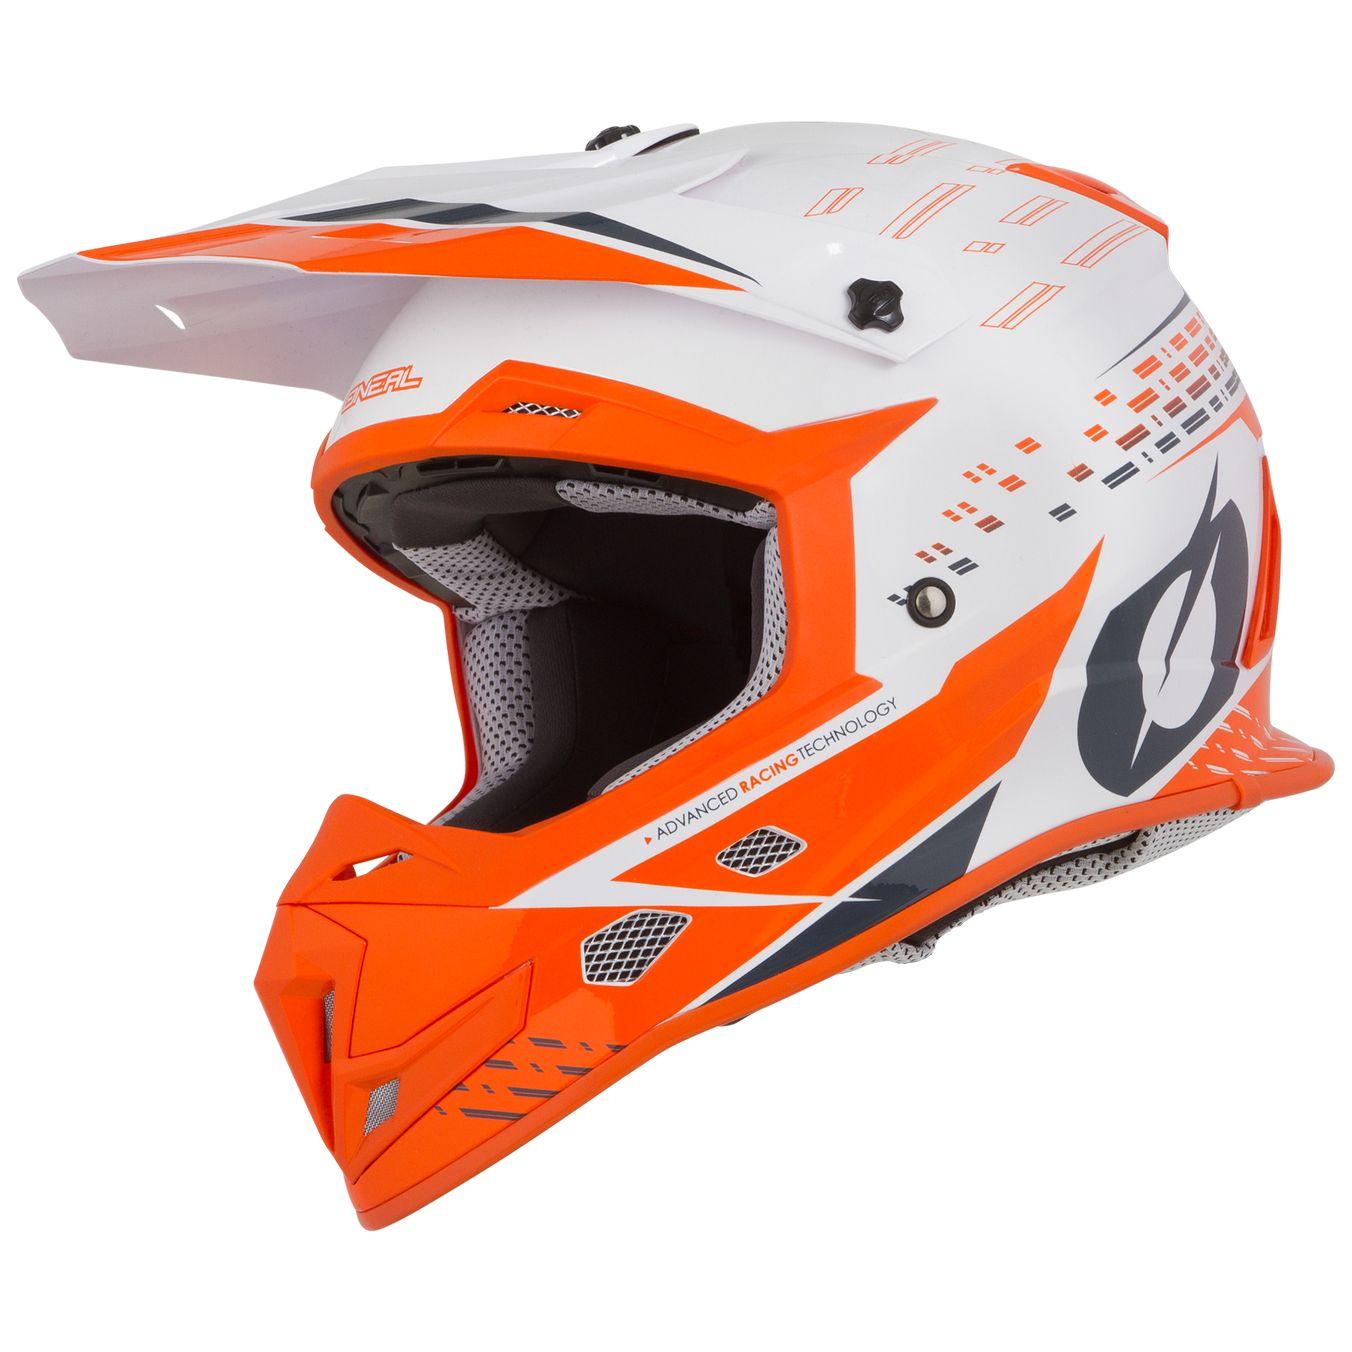 44db7204067ce Casco de motocross O Neal 5 SERIES - TRACE - WHITE ORANGE 2019 ...